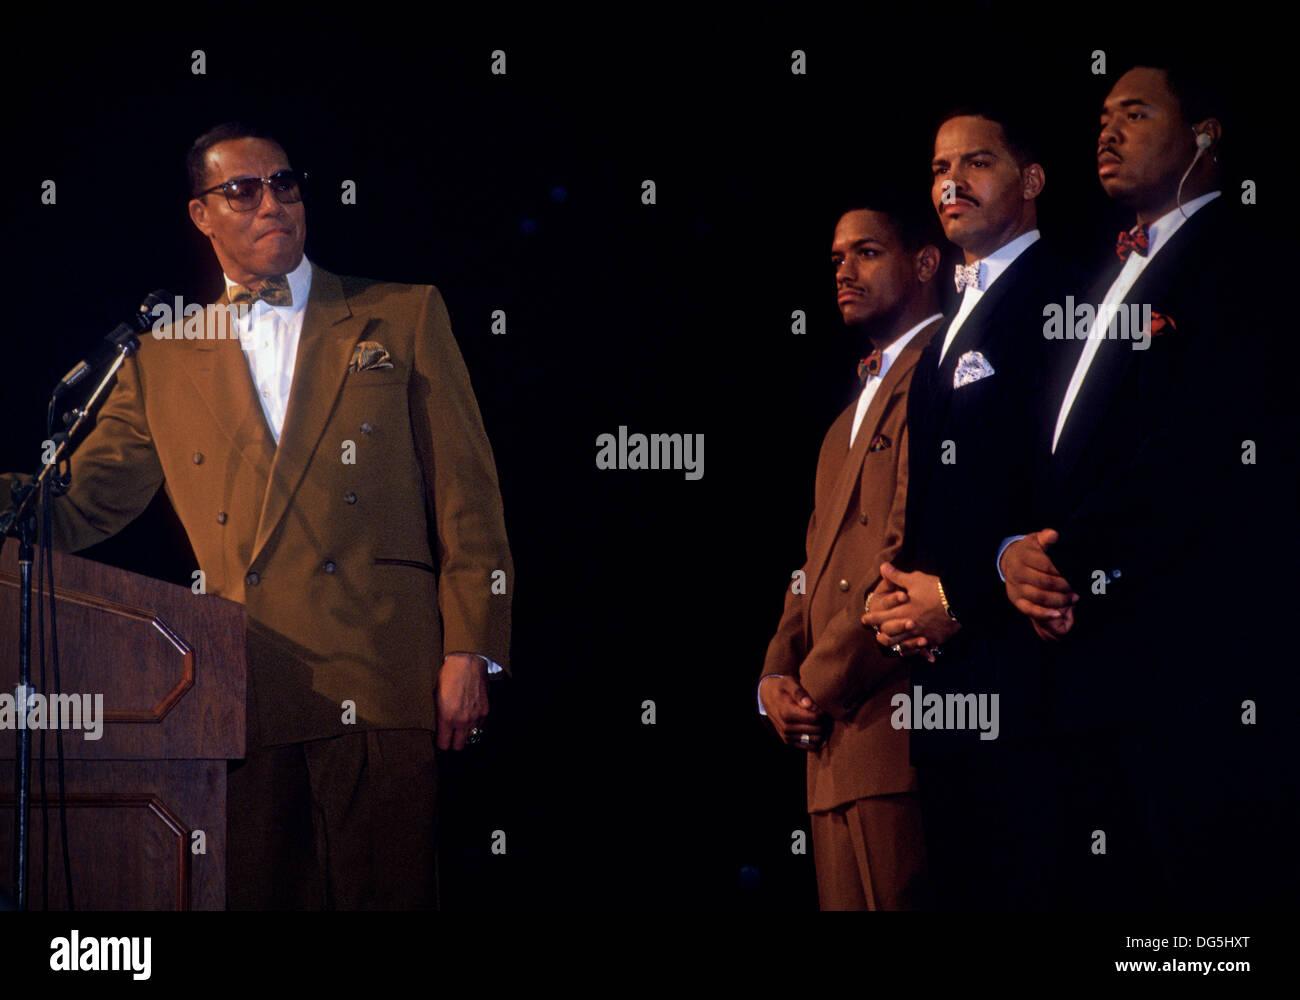 New York City, NY - 1992 Minister Louis Farrakhan, Nation of Islam - Stock Image